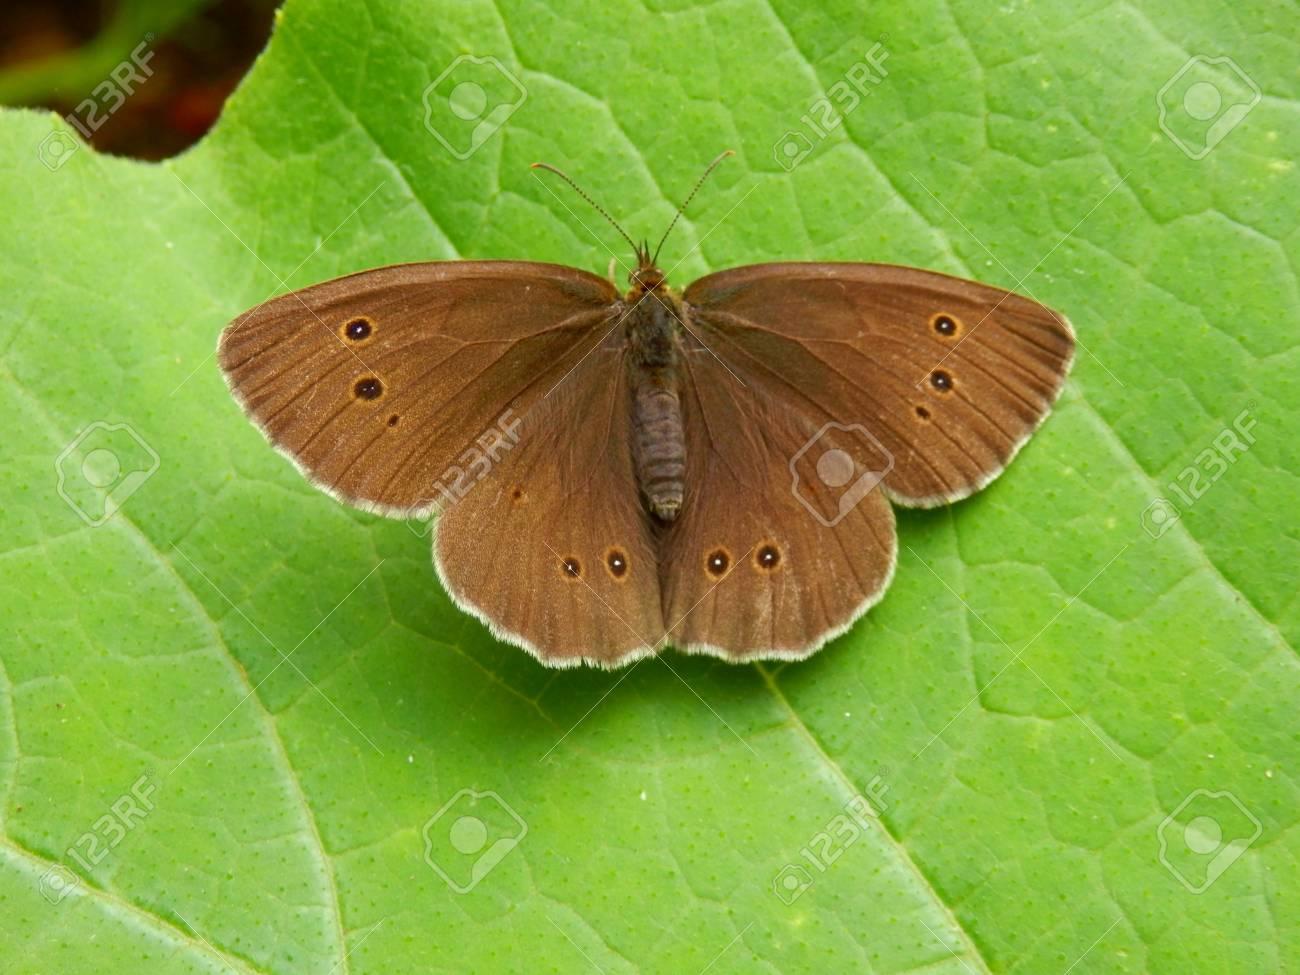 Ringlet Butterfly (Aphantopus hyperantus) on a Butternut squash leaf Stock Photo - 16821360